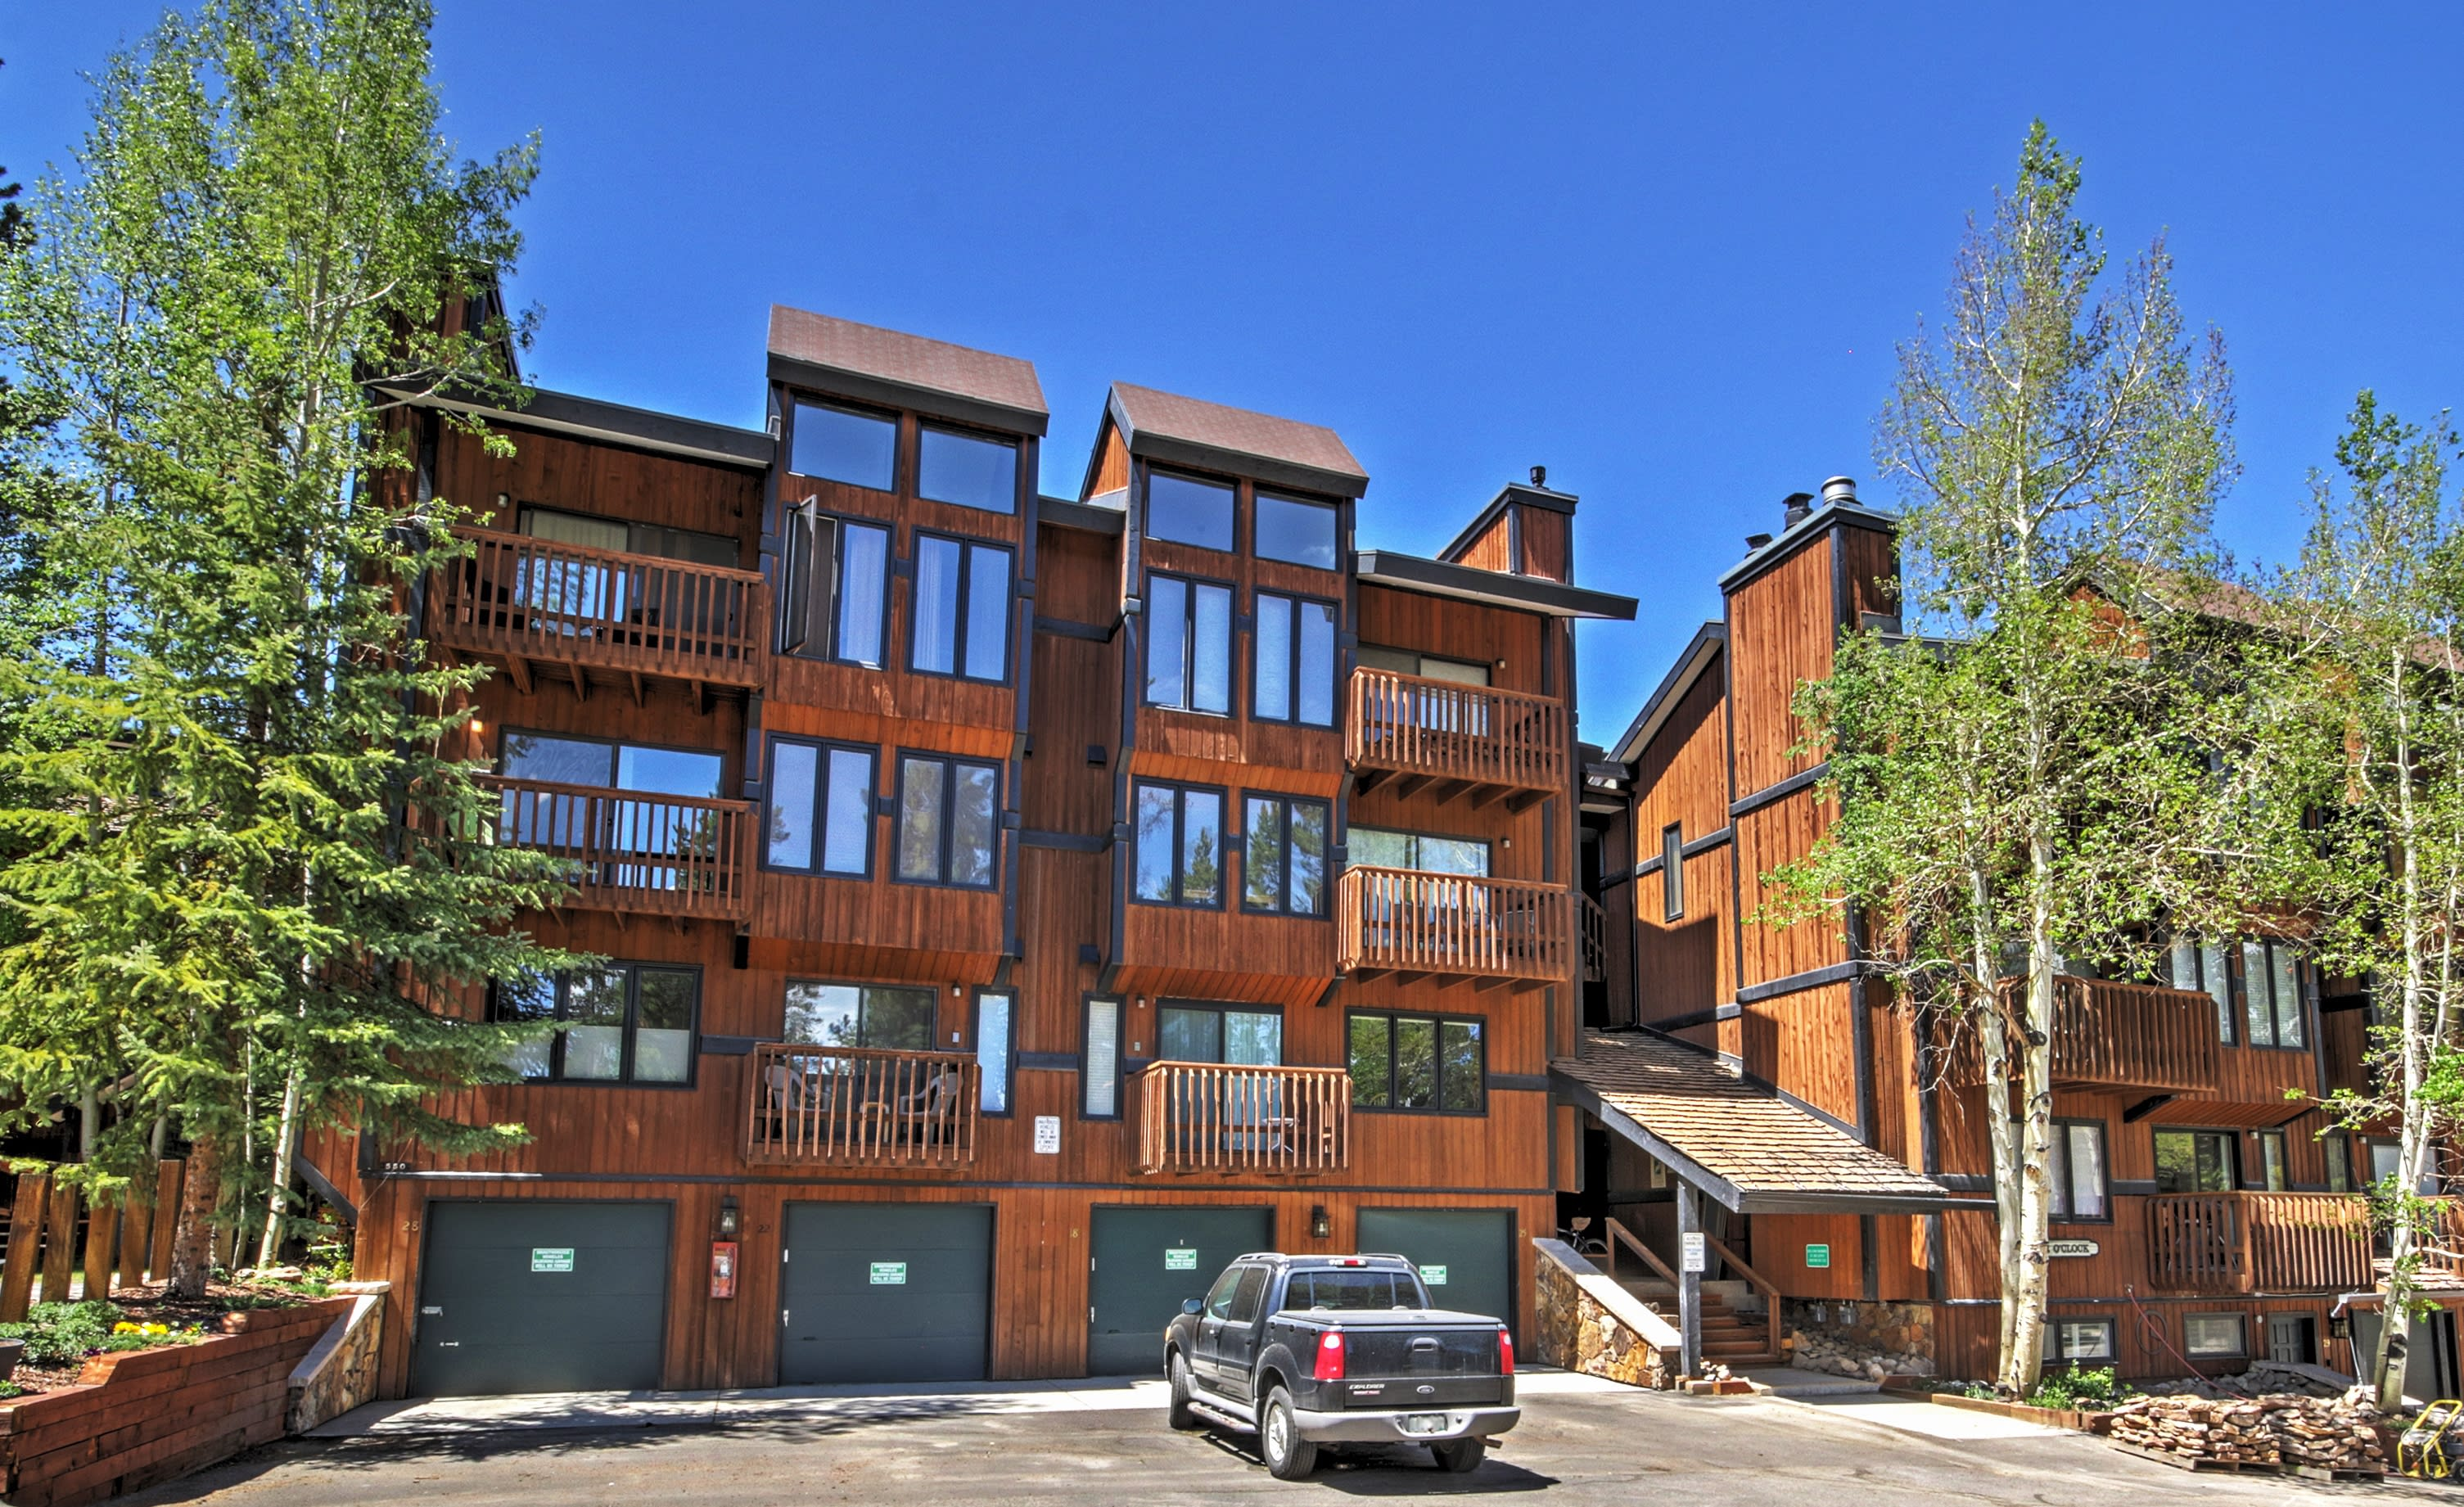 Breckenridge Vacation Rental | 1BR | 1BA | Ground Floor Unit